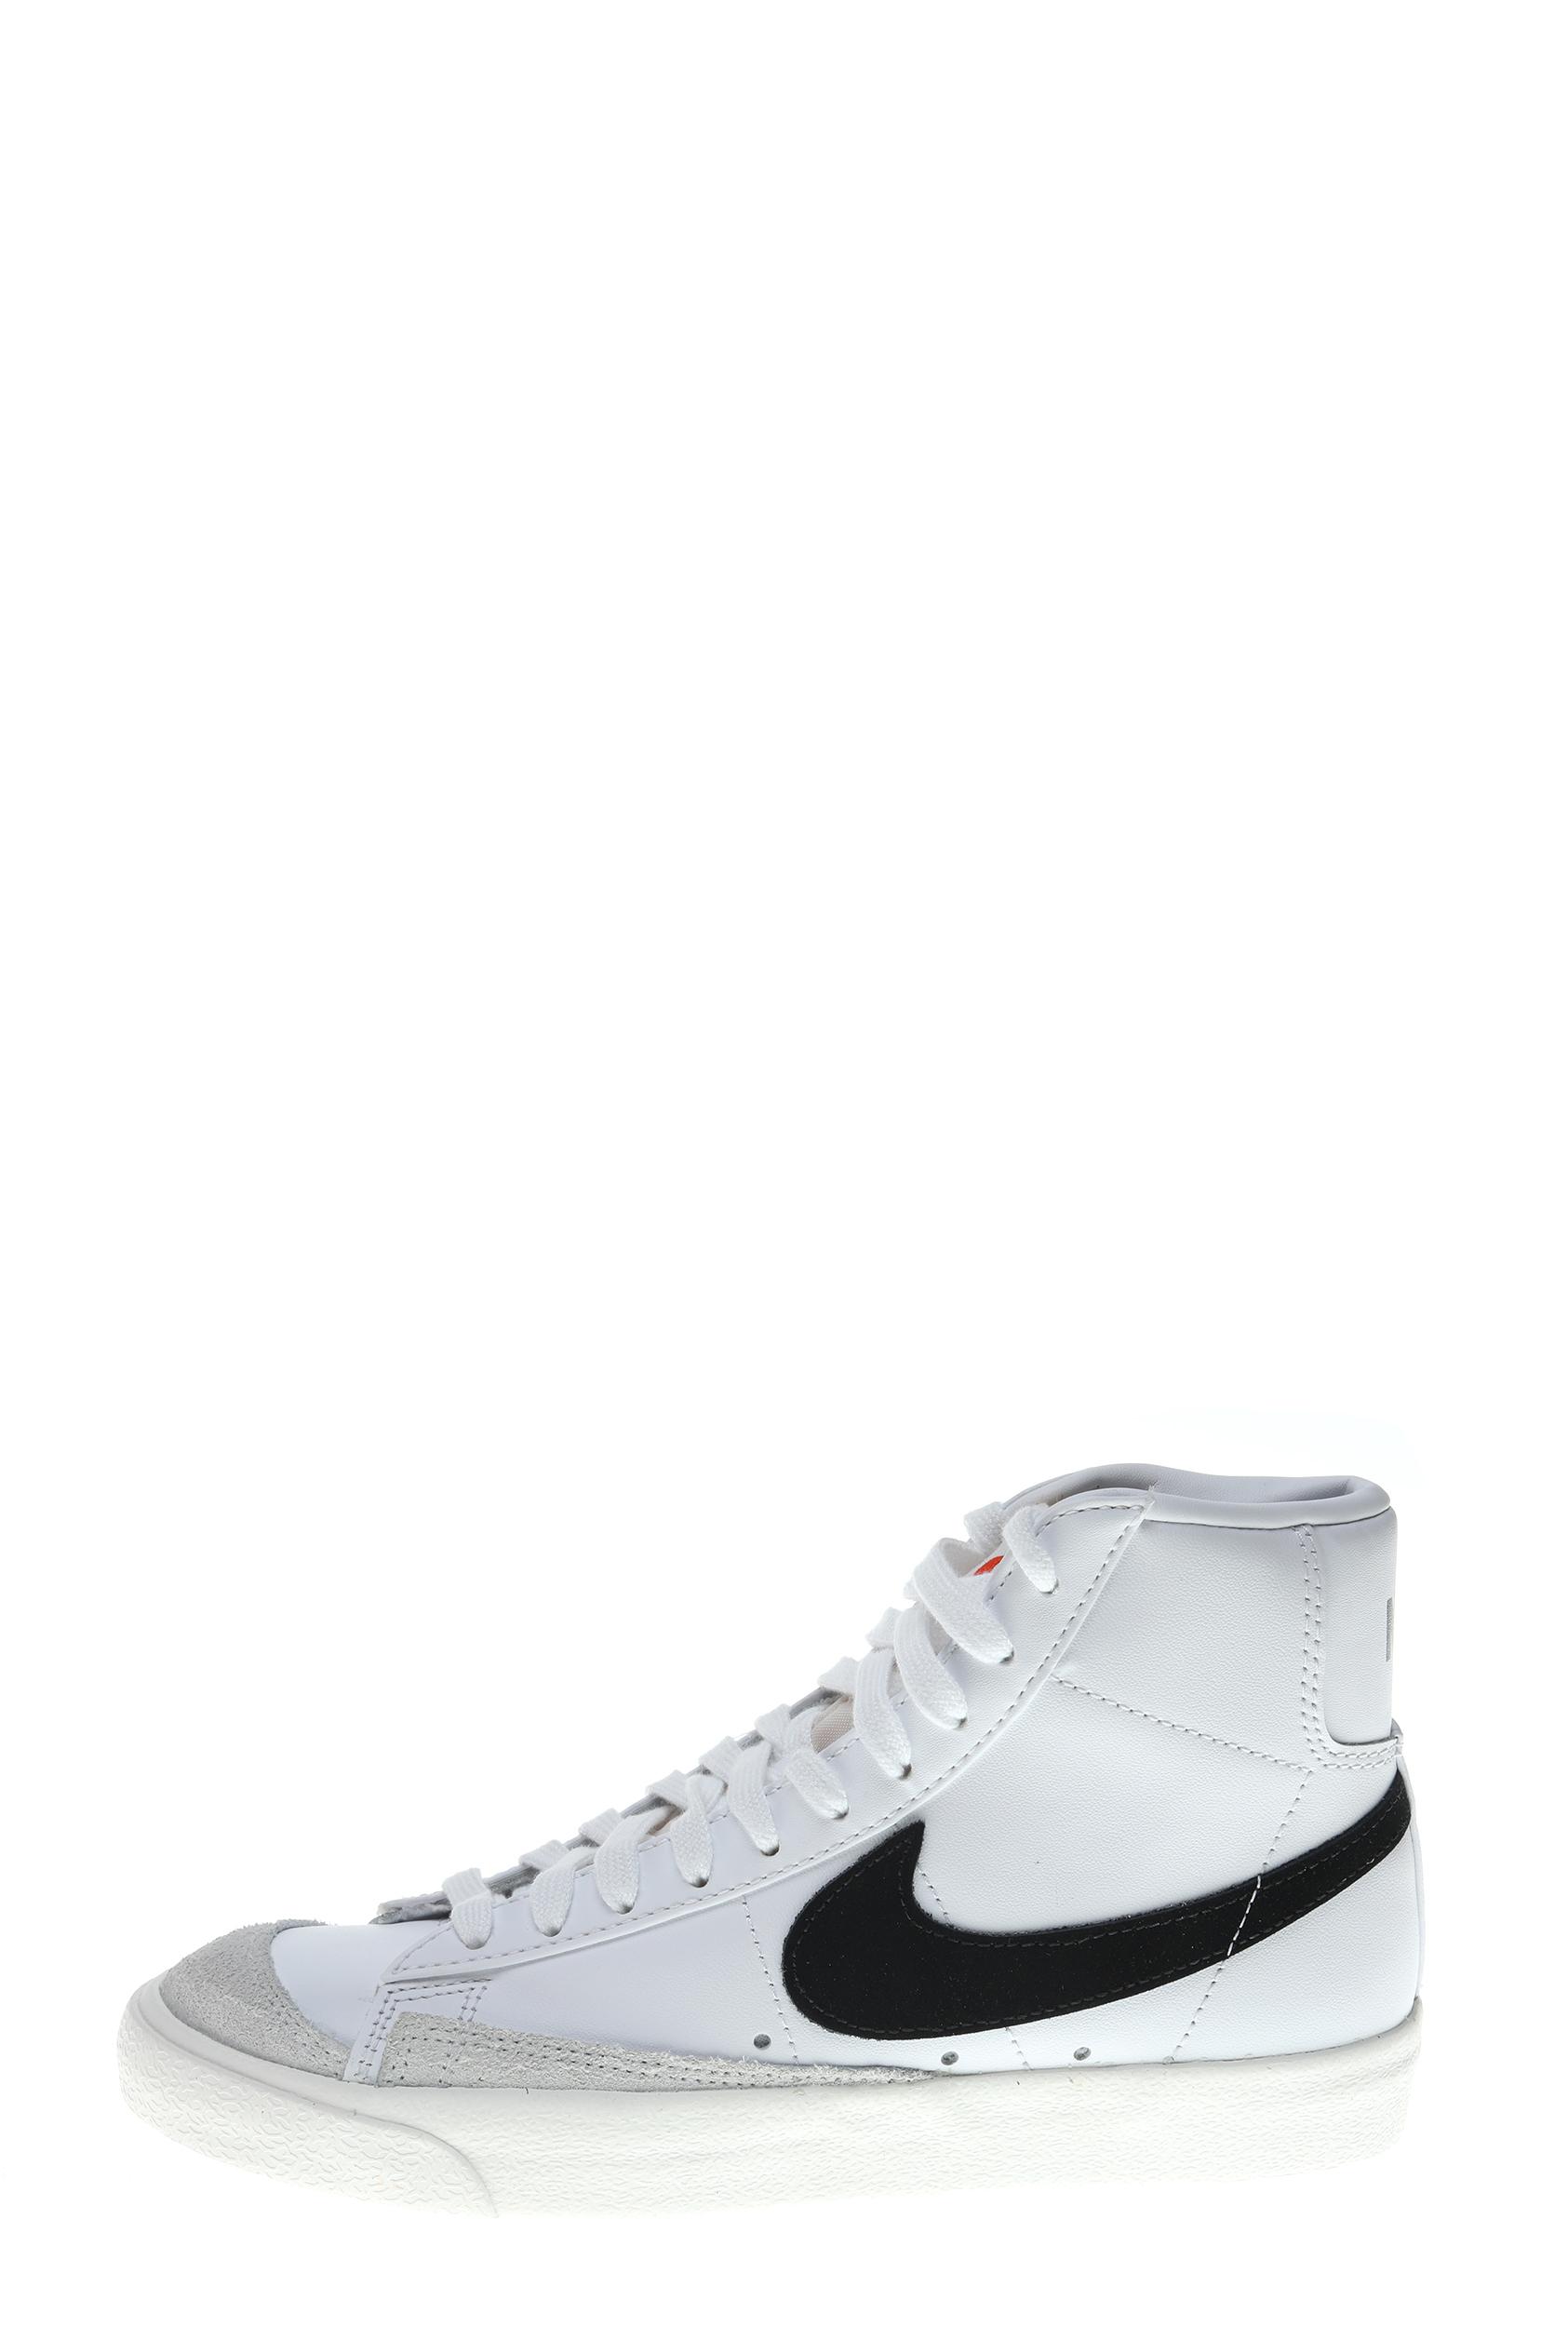 NIKE – Γυναικεία αθλητικά παπουτσία NIKE BLAZER MID '77 λευκά